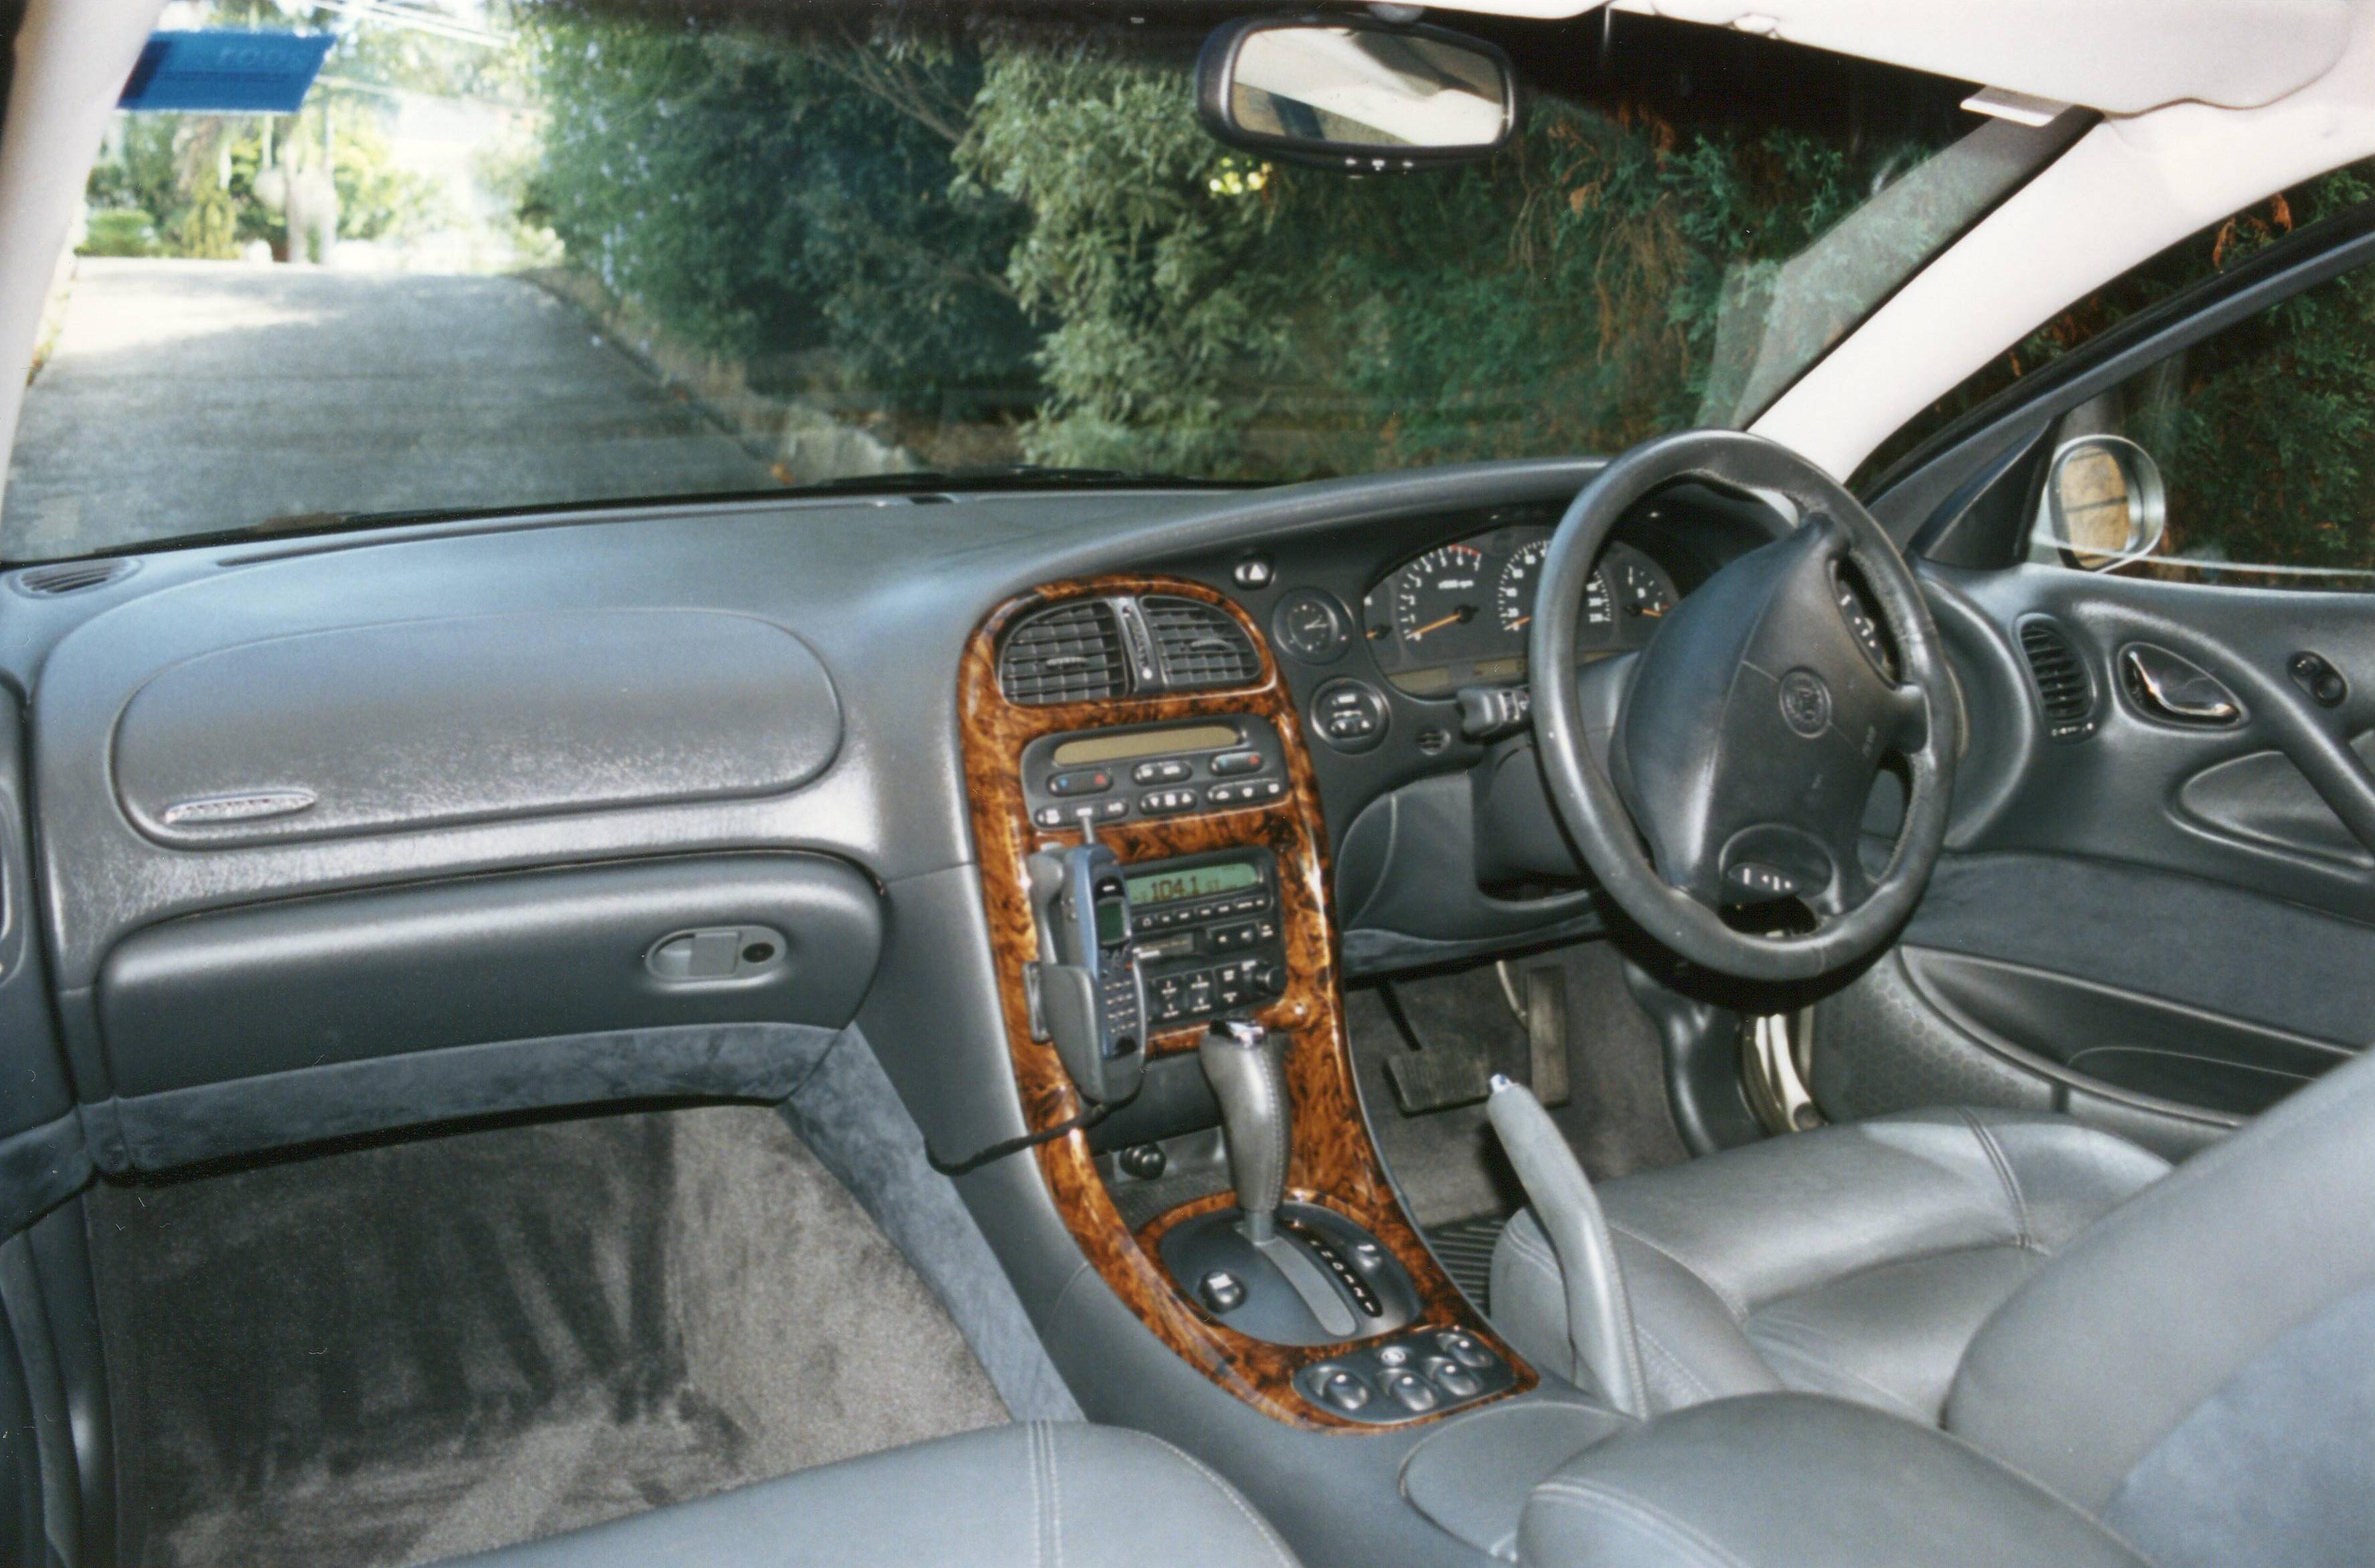 file 1999 holden caprice wh sedan 16665281054 jpg wikimedia rh commons wikimedia org 2001 Chevrolet 2001 Chevy Impala SS